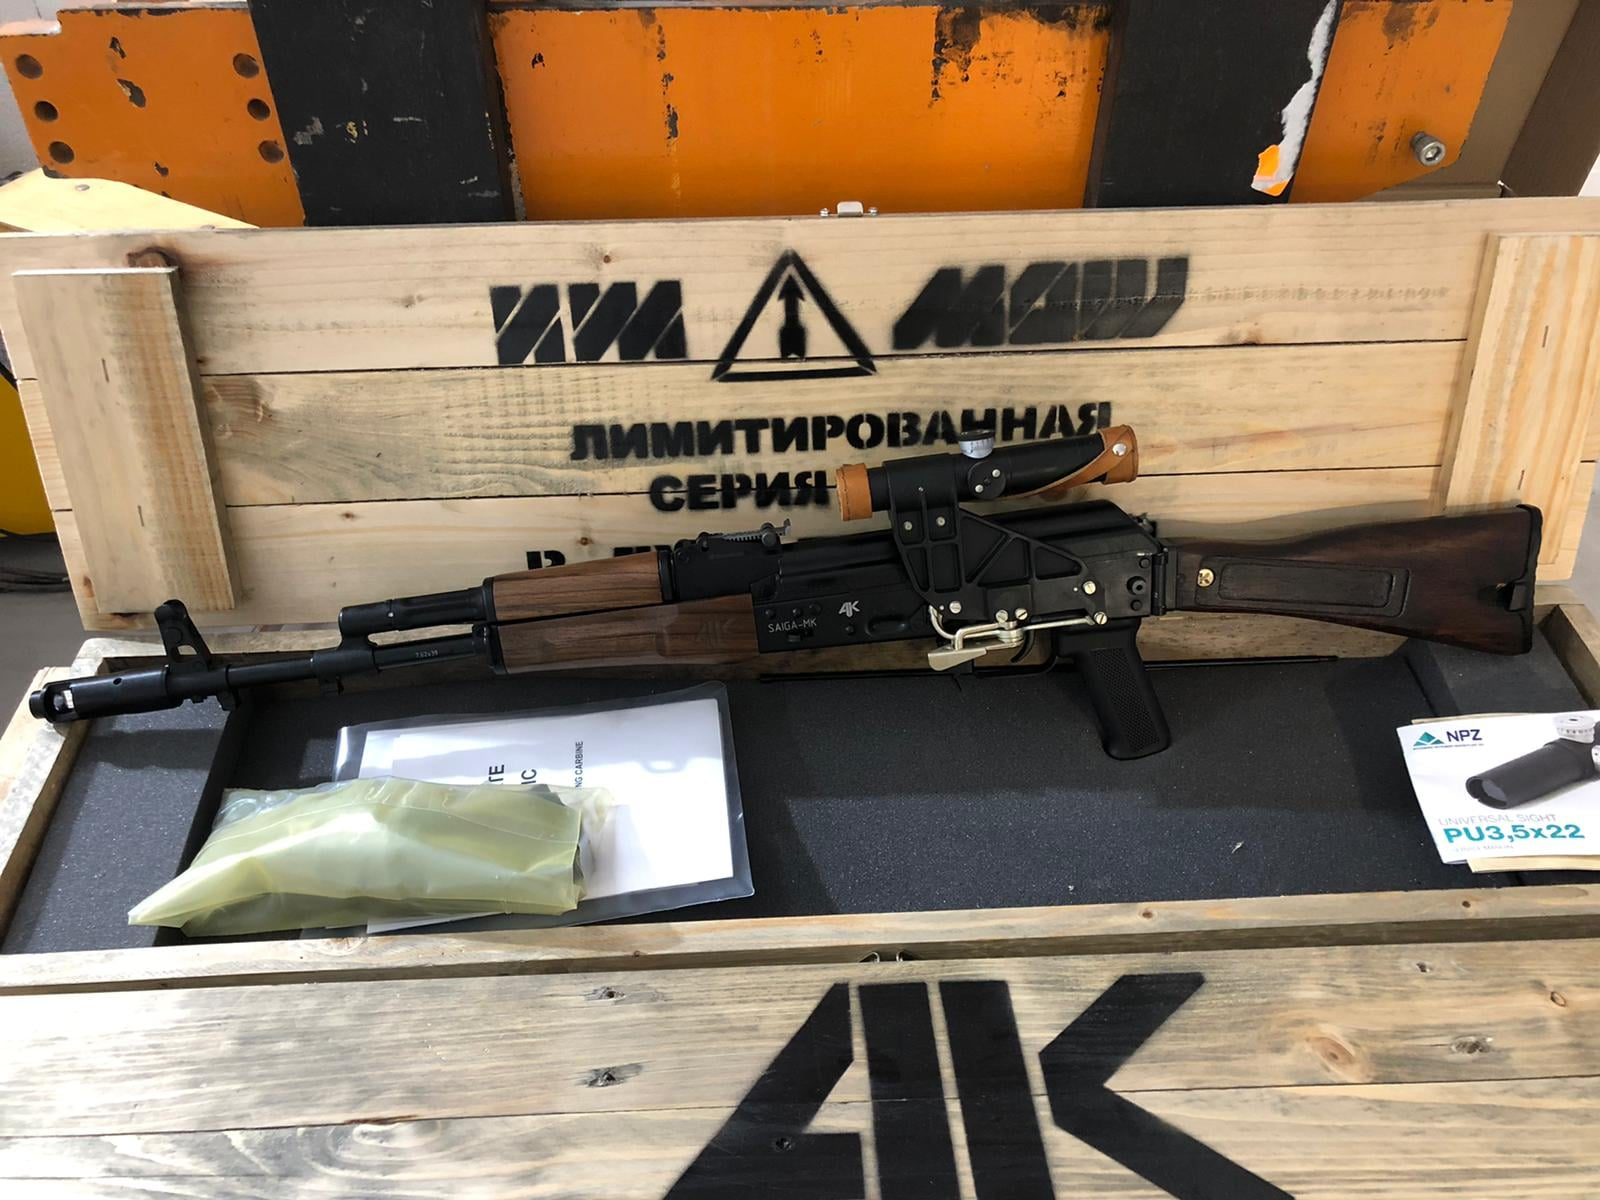 carabina-semiautomatica-marca-izhmash-modello-mk-103-sot--spirit-of-tadition-calibro-762x39-0